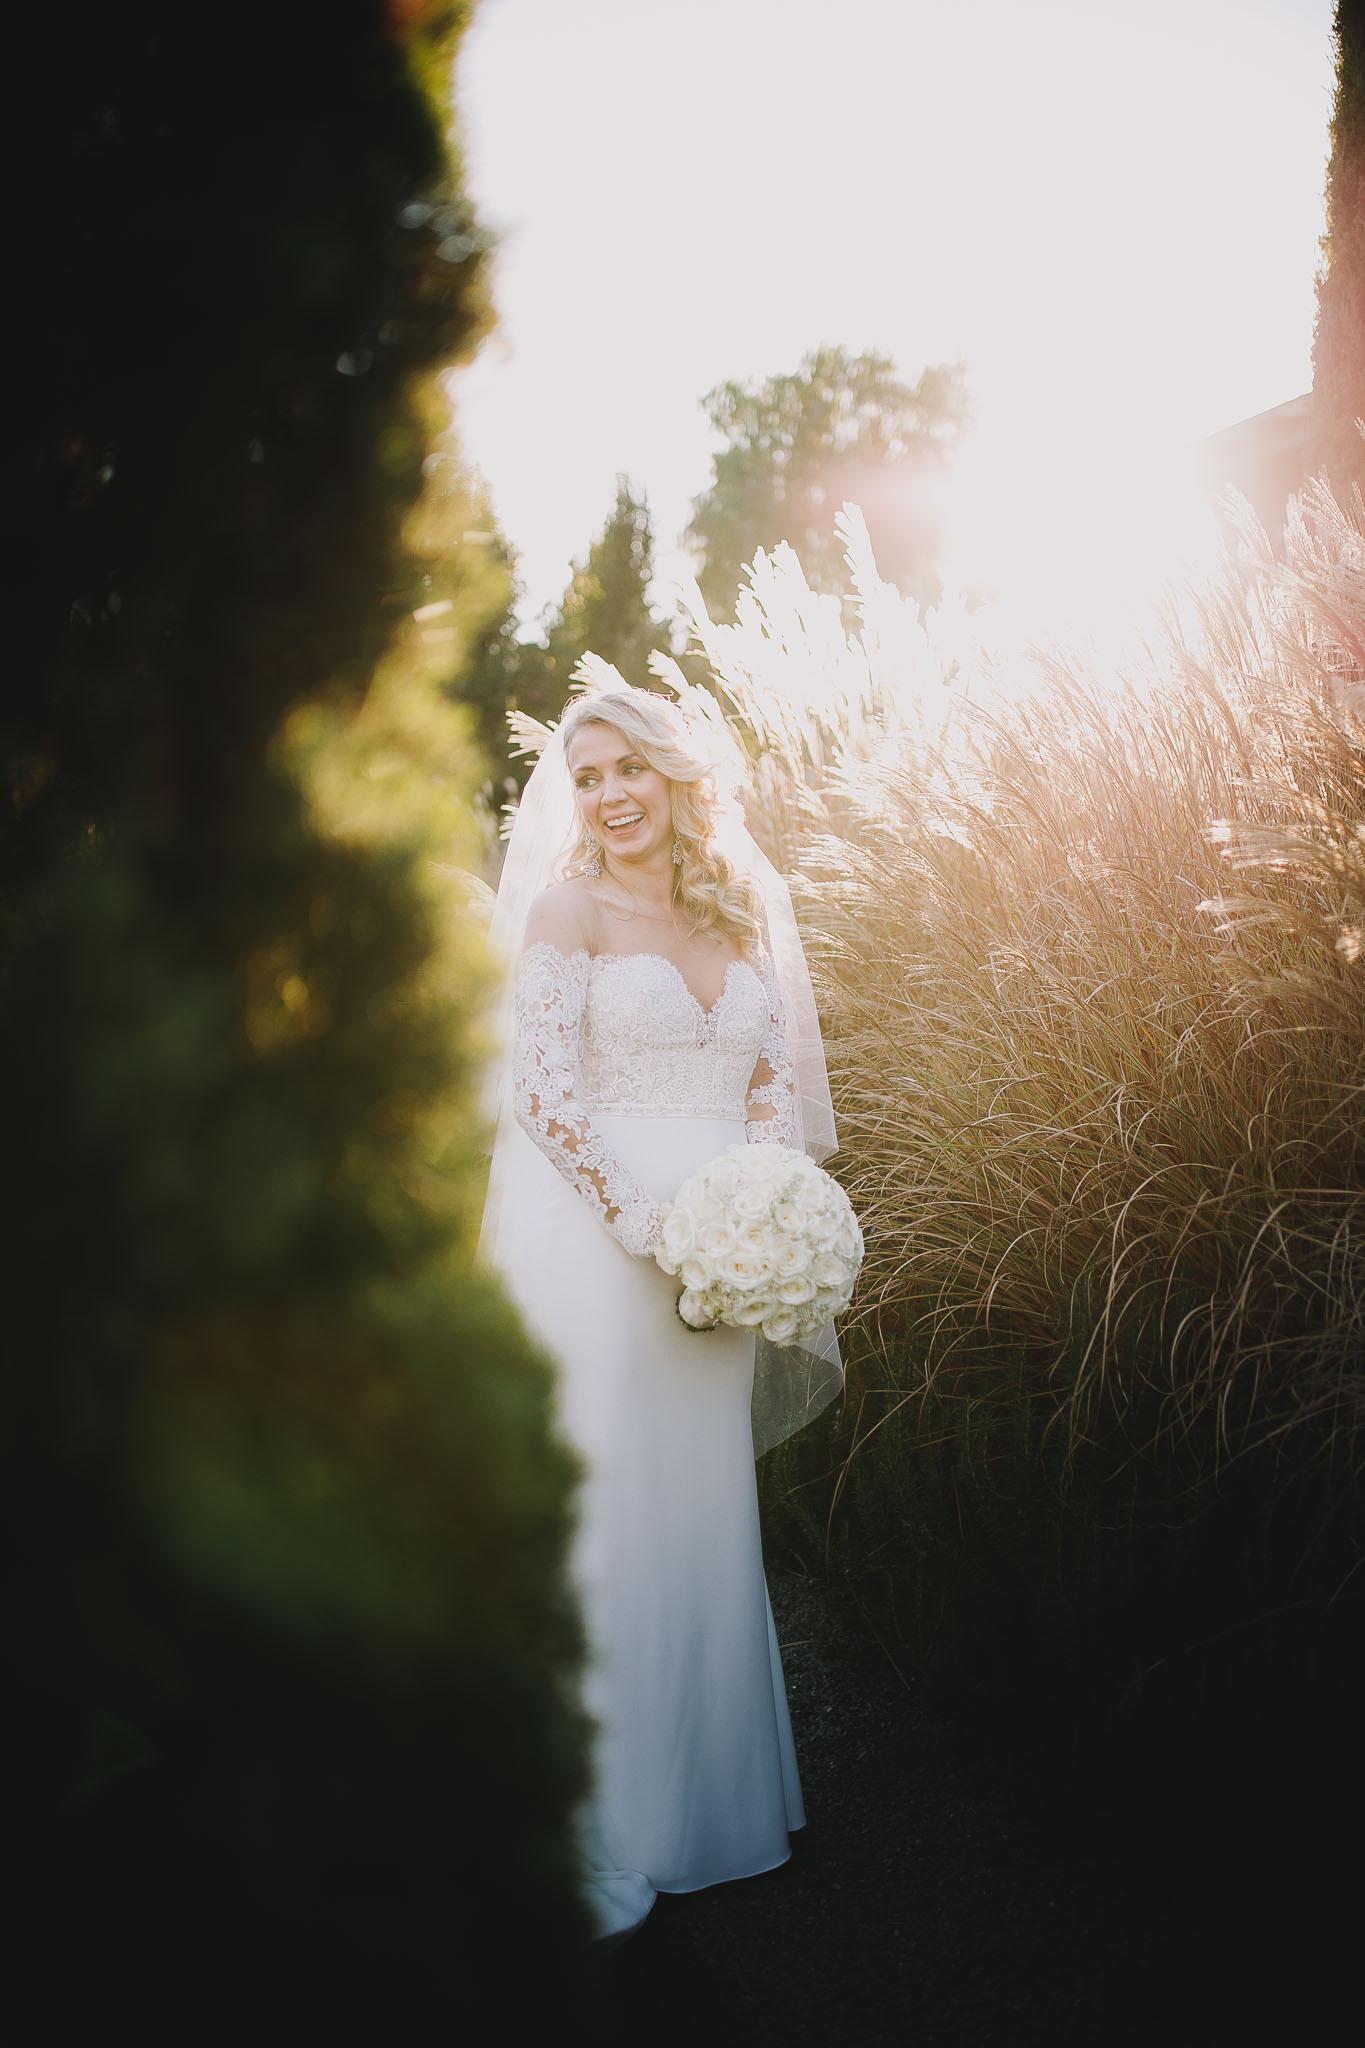 Archer Inspired Wedding Photography Menlo Park California High End Photographer-23.jpg